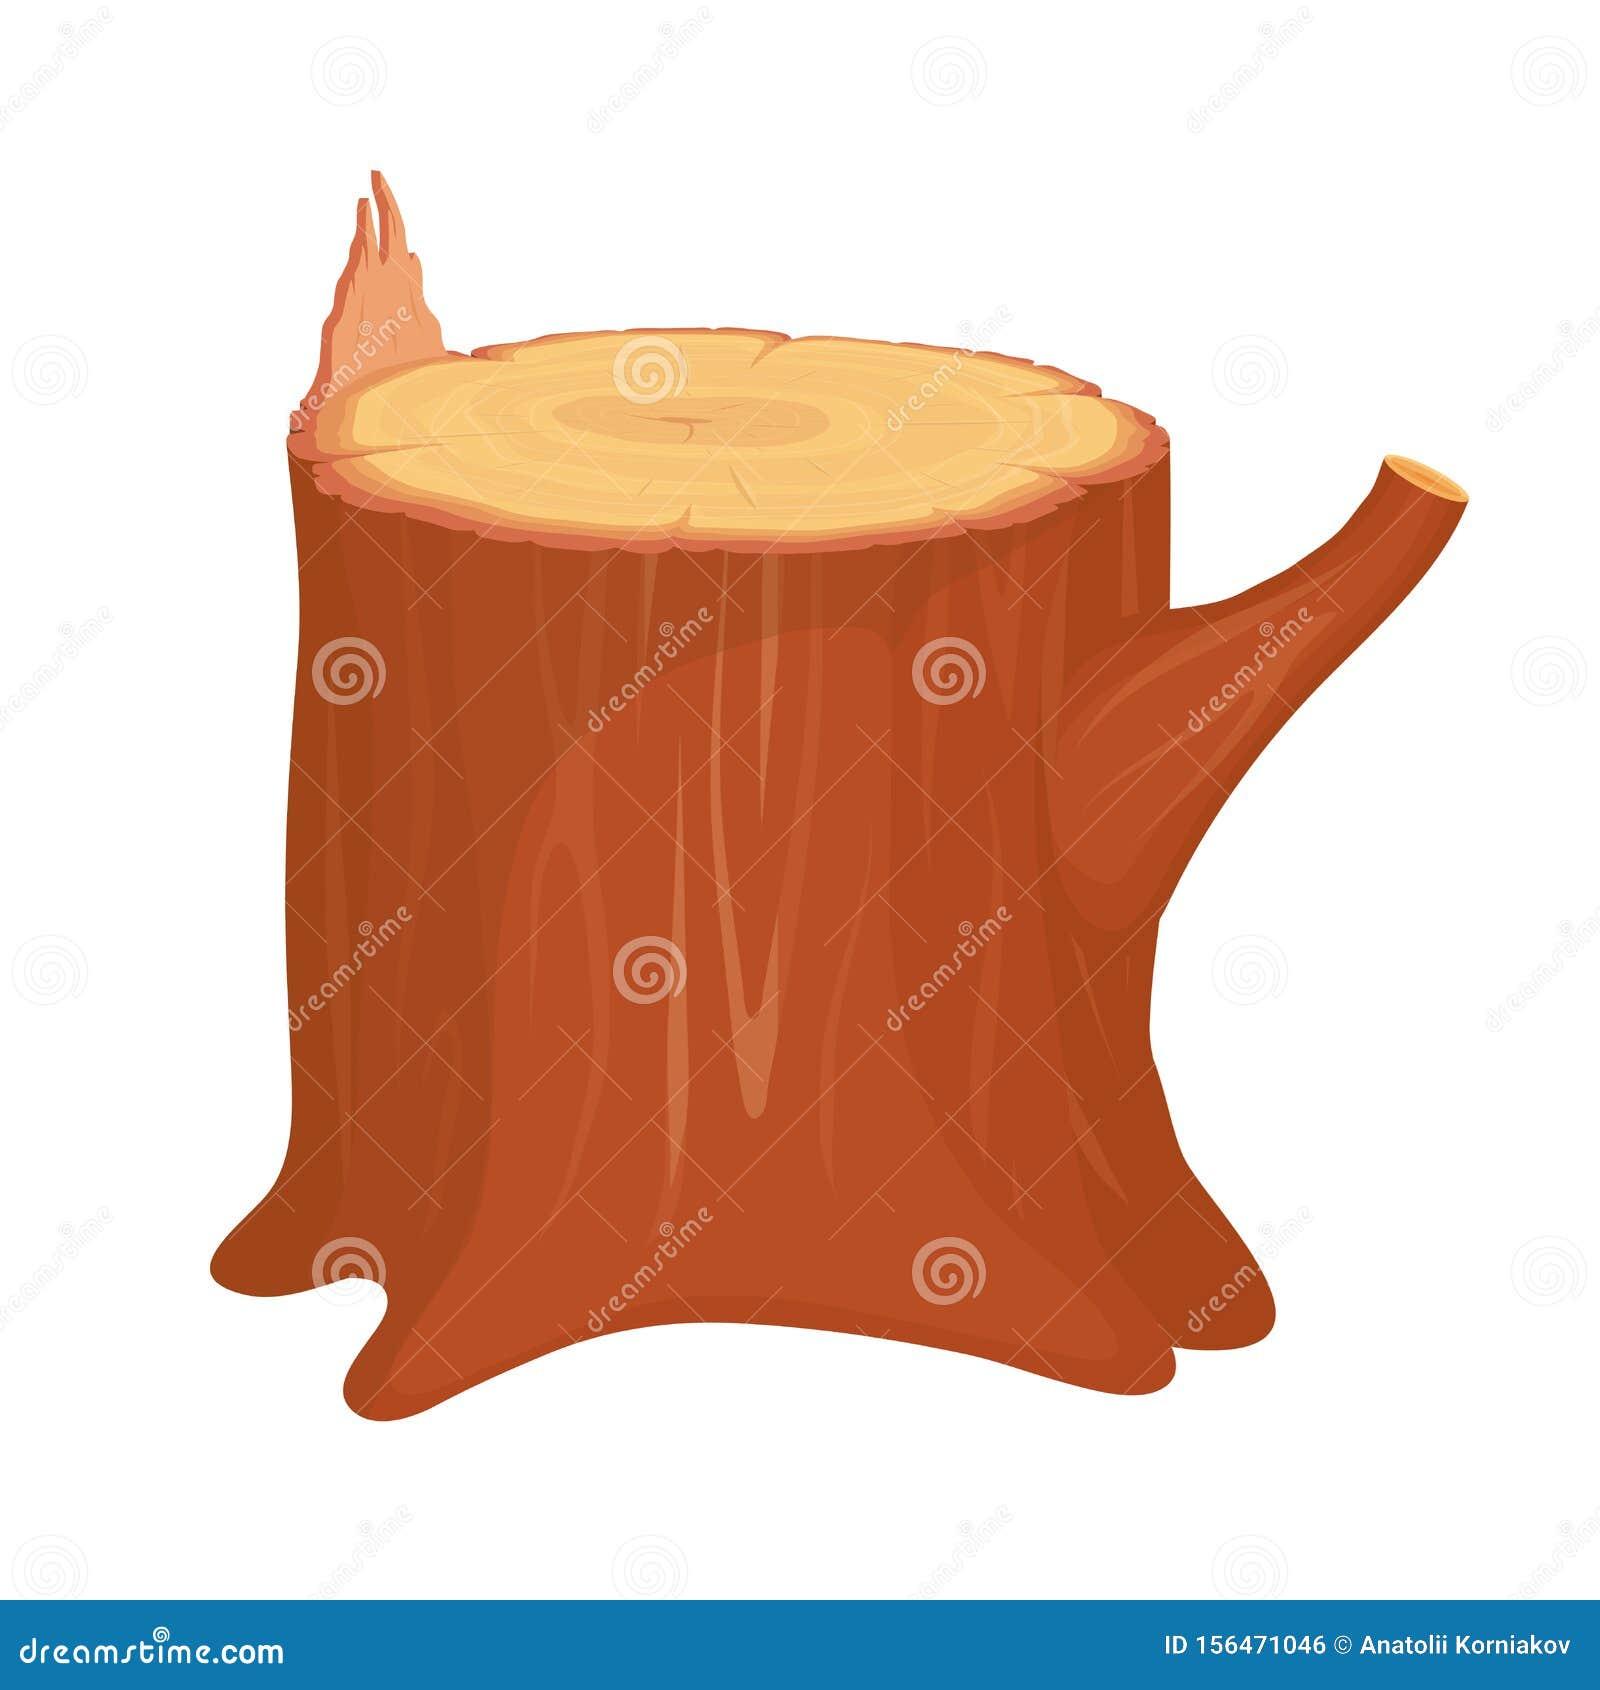 Tree Stump Cartoon Tree Stump On White Background Stock Vector Illustration Of Isolated Fuel 156471046